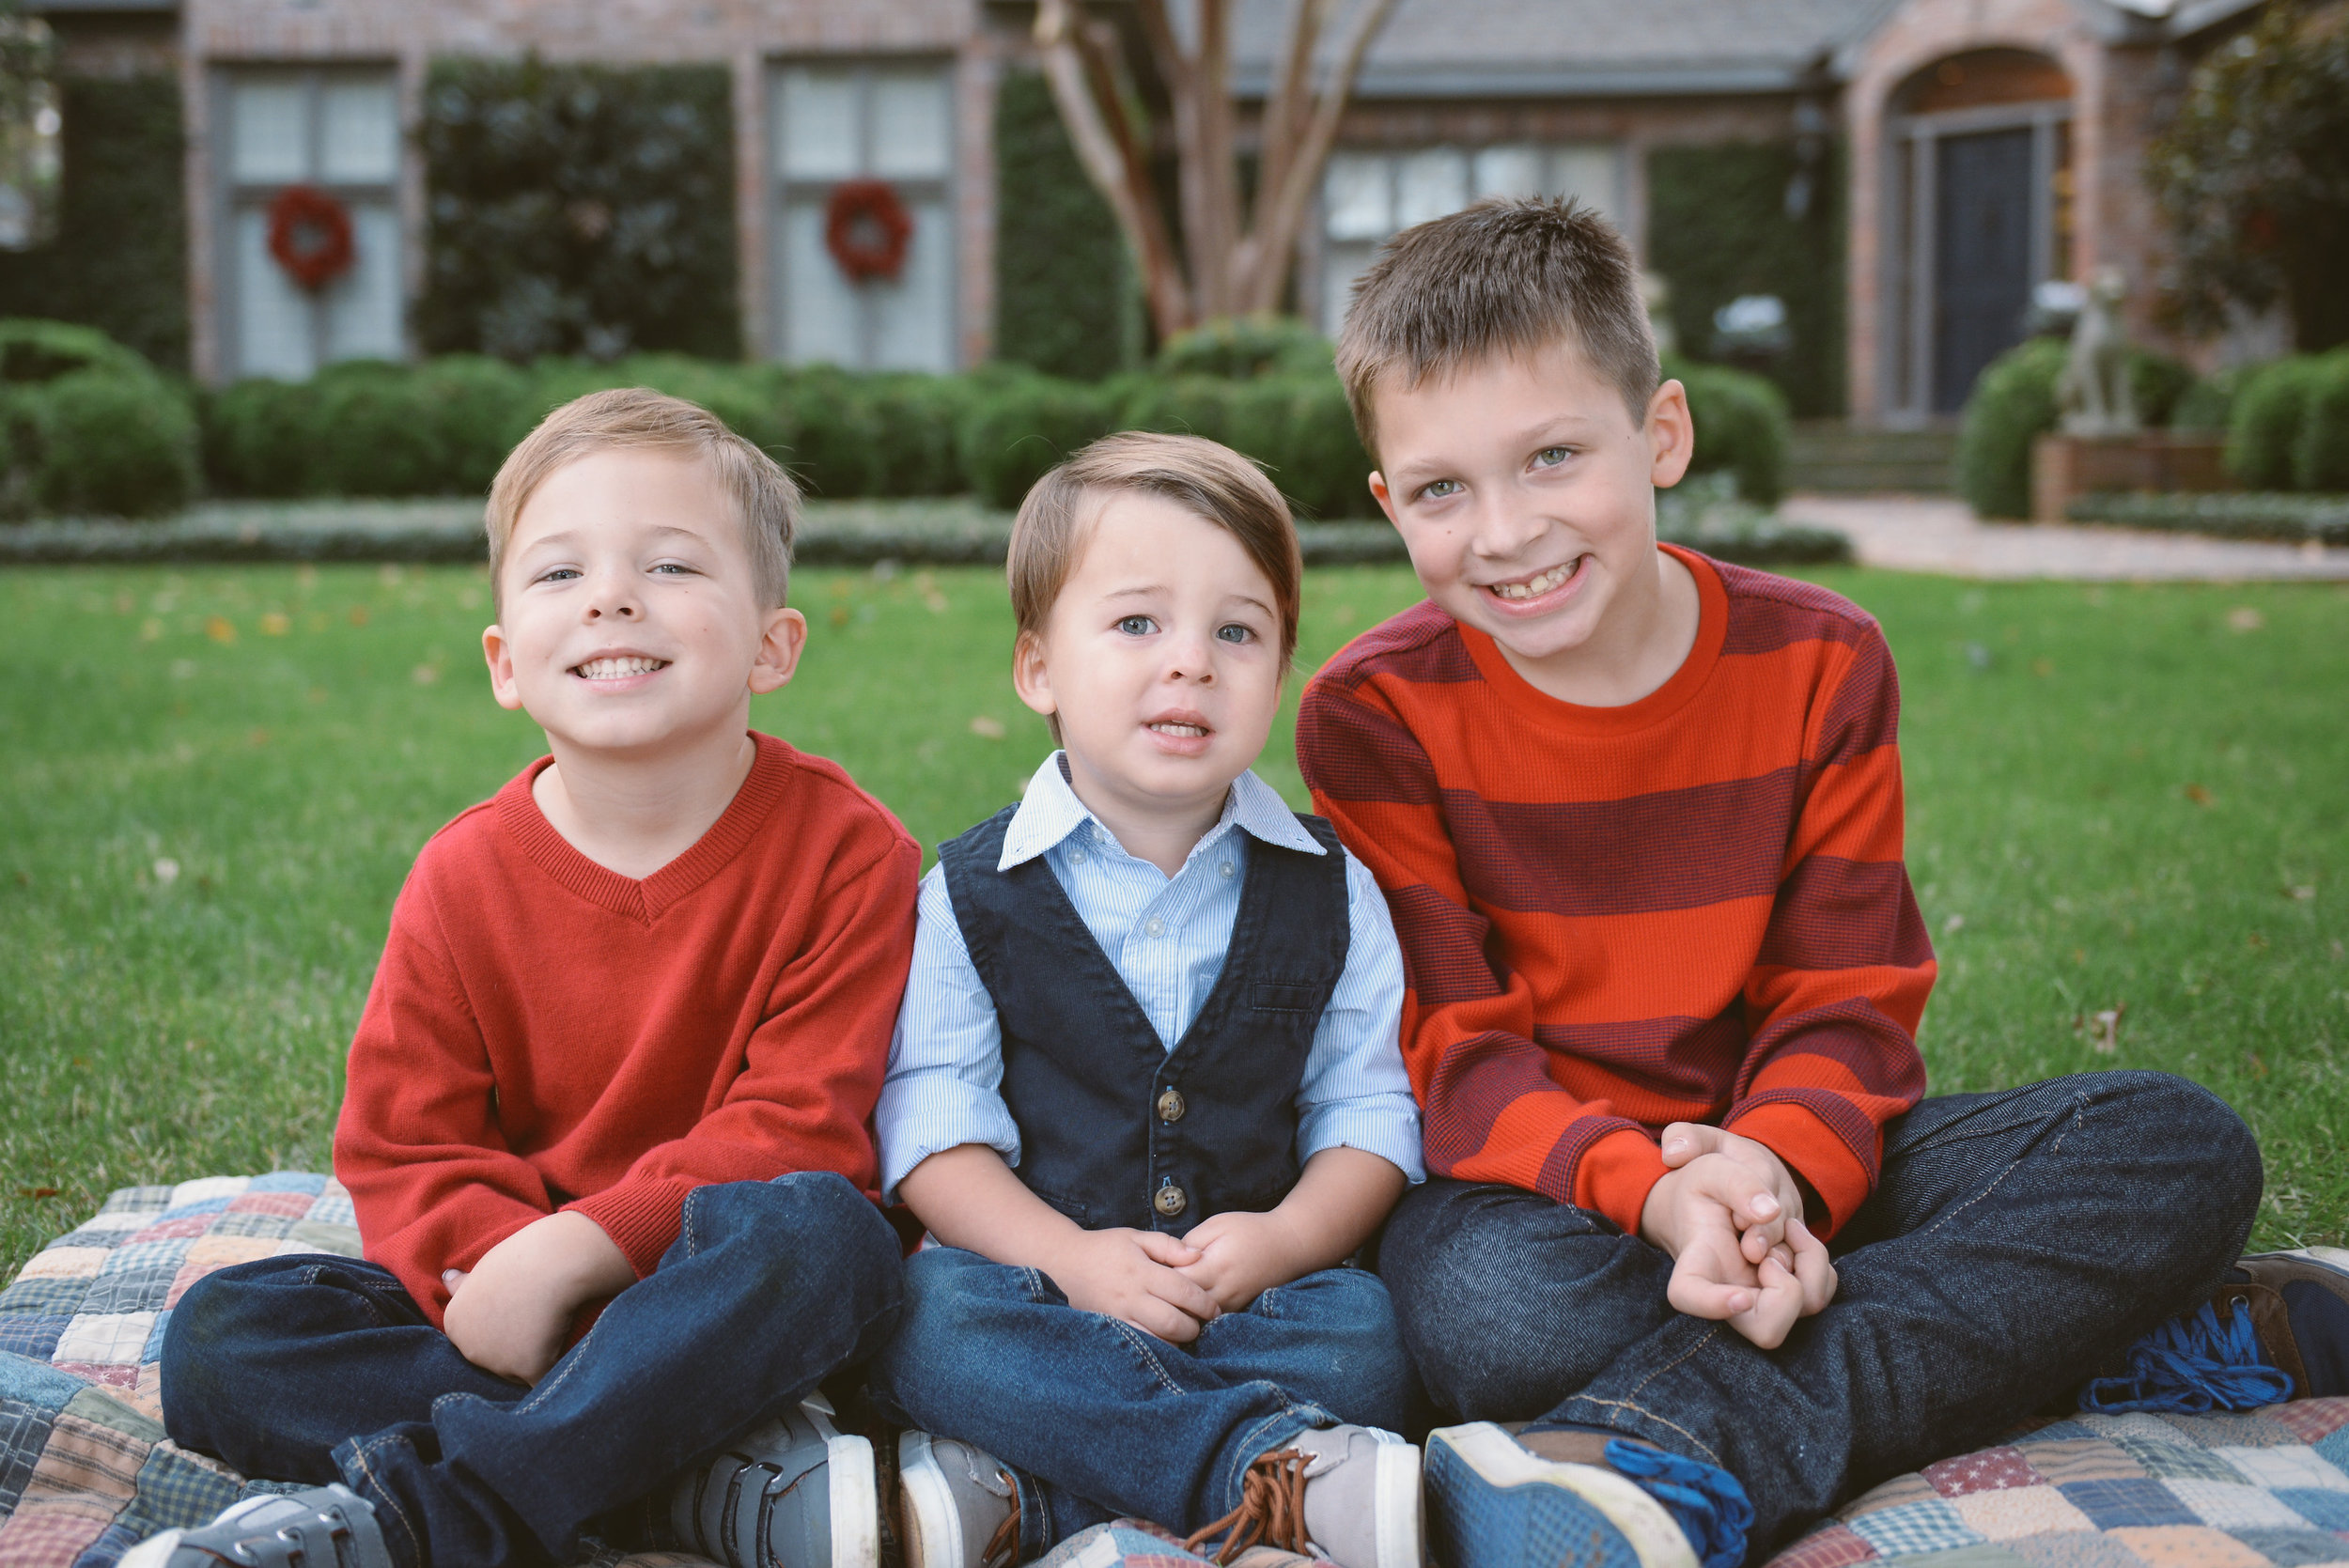 three brothers sitting on grass